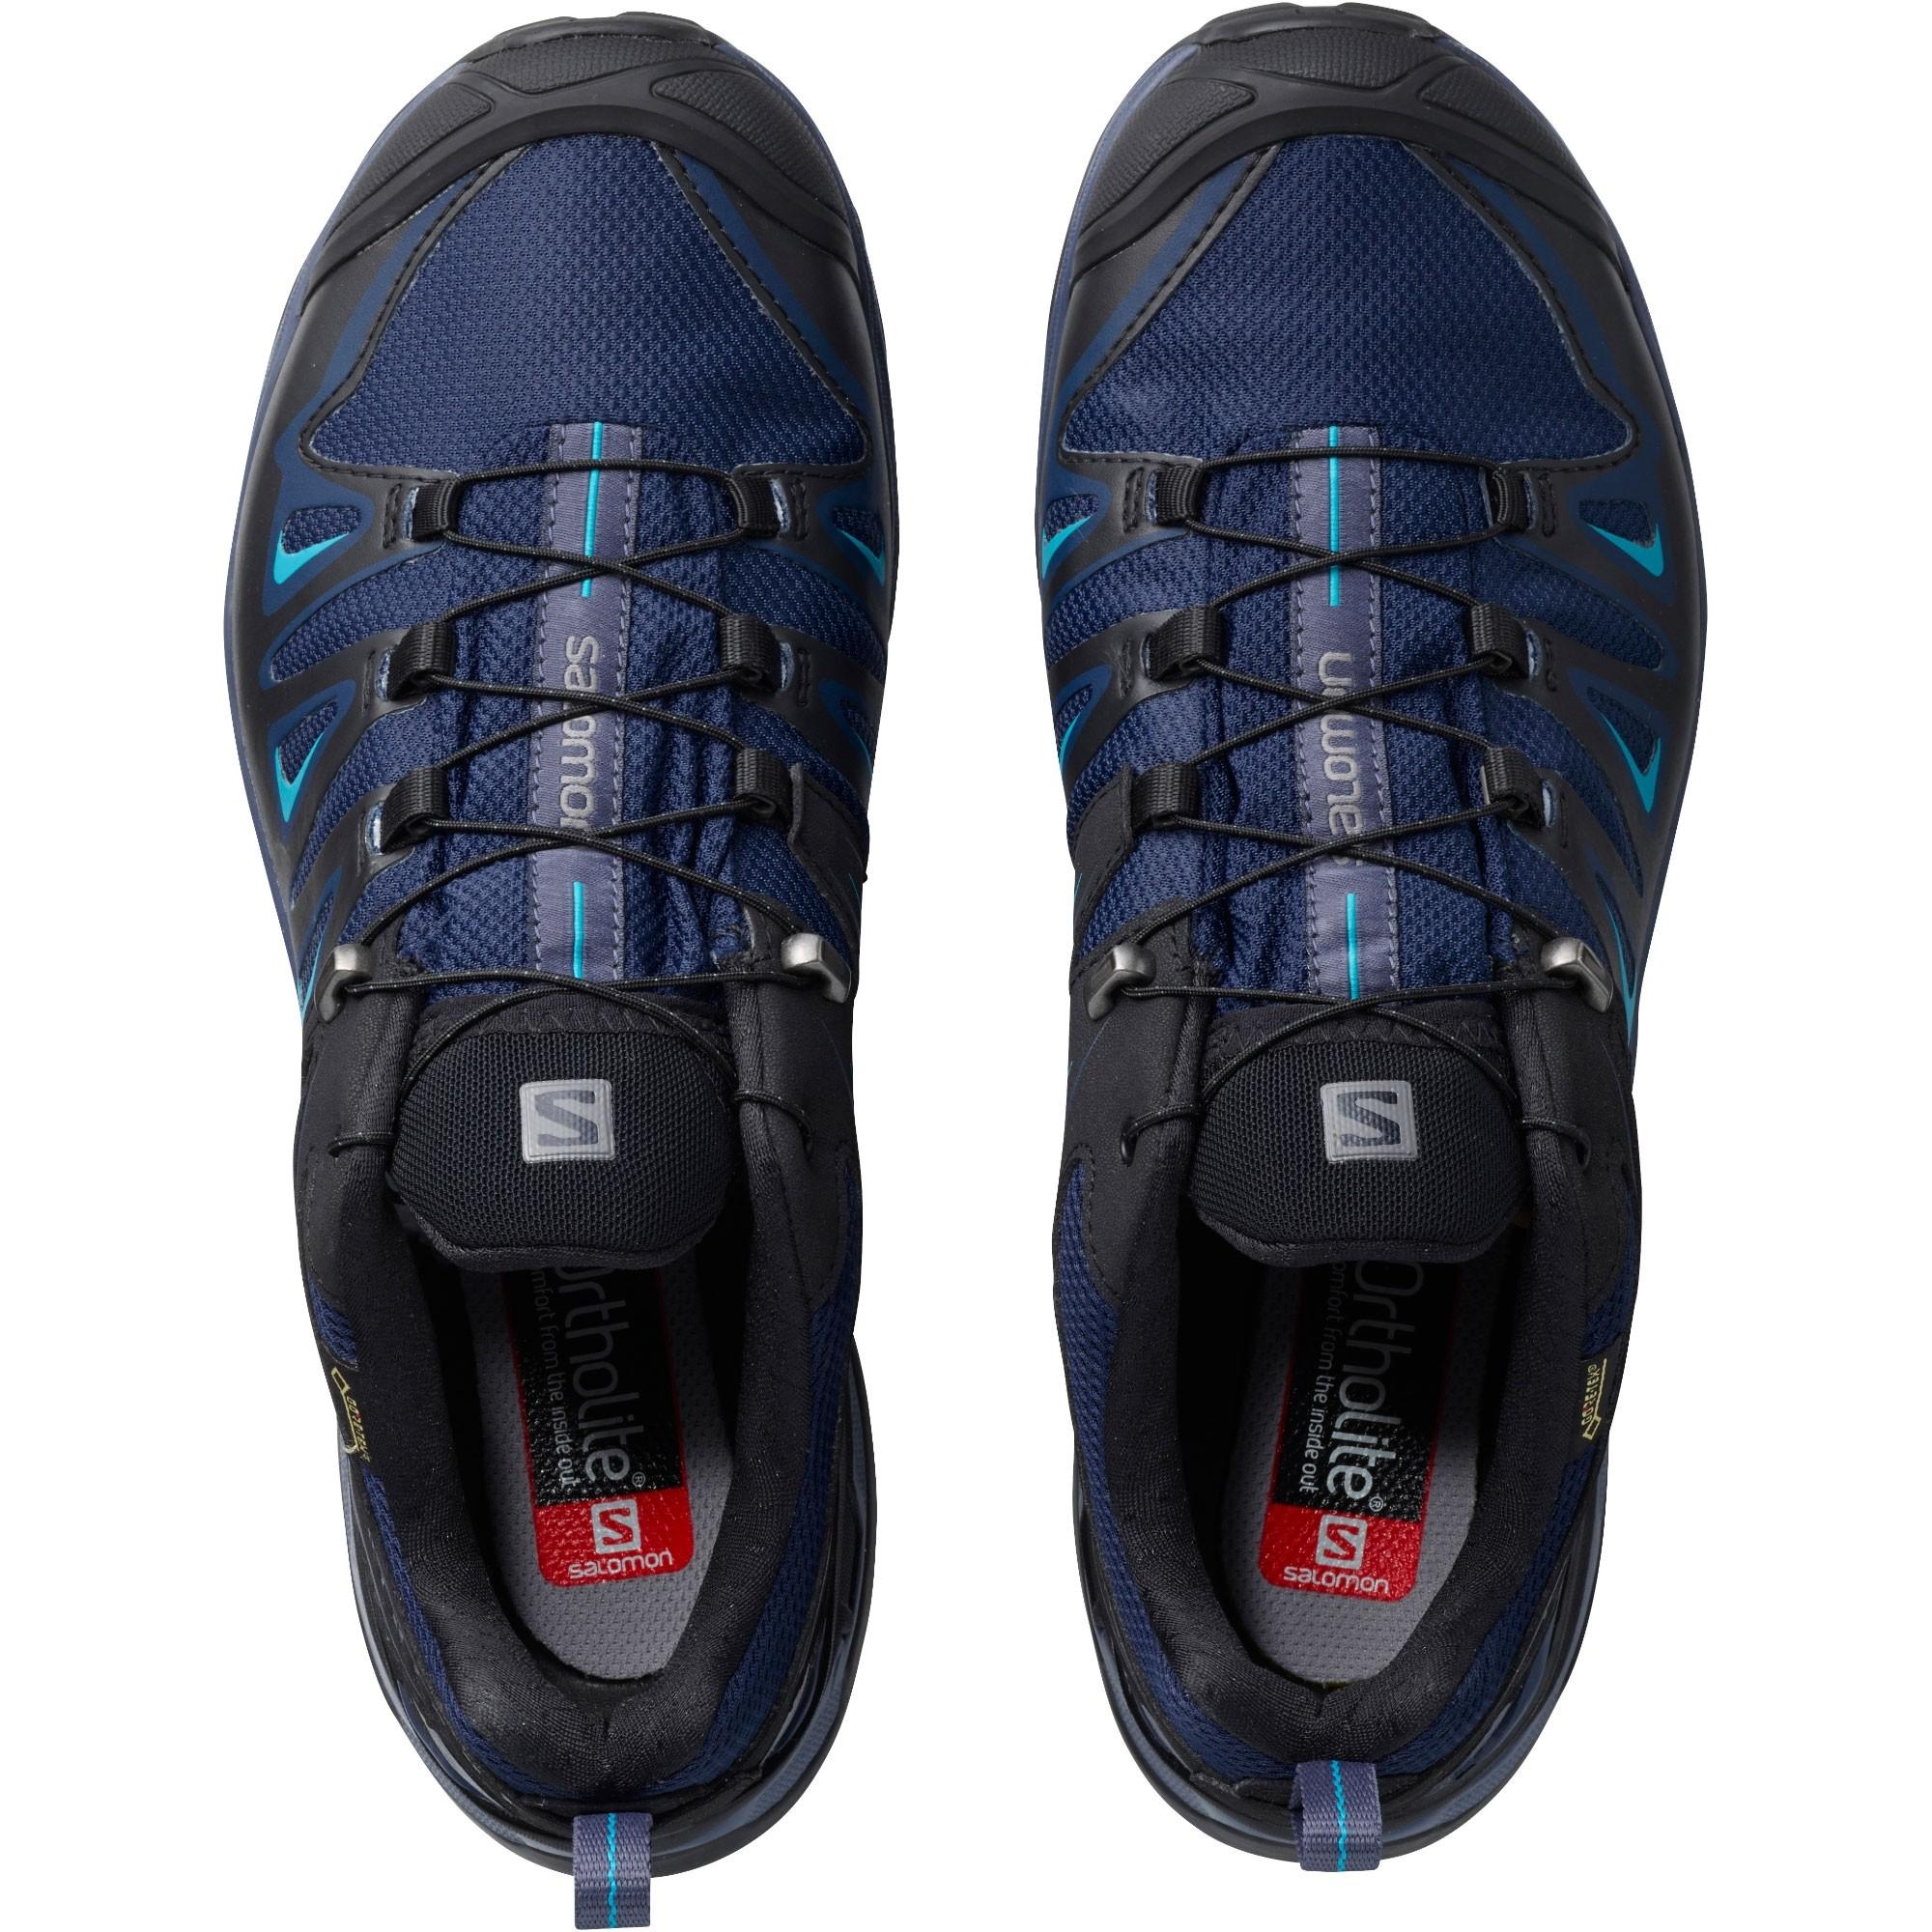 Salomon X Ultra 3 GTX Women's Approach Shoes - Medieval Blue/Black/Hawaiian Surf